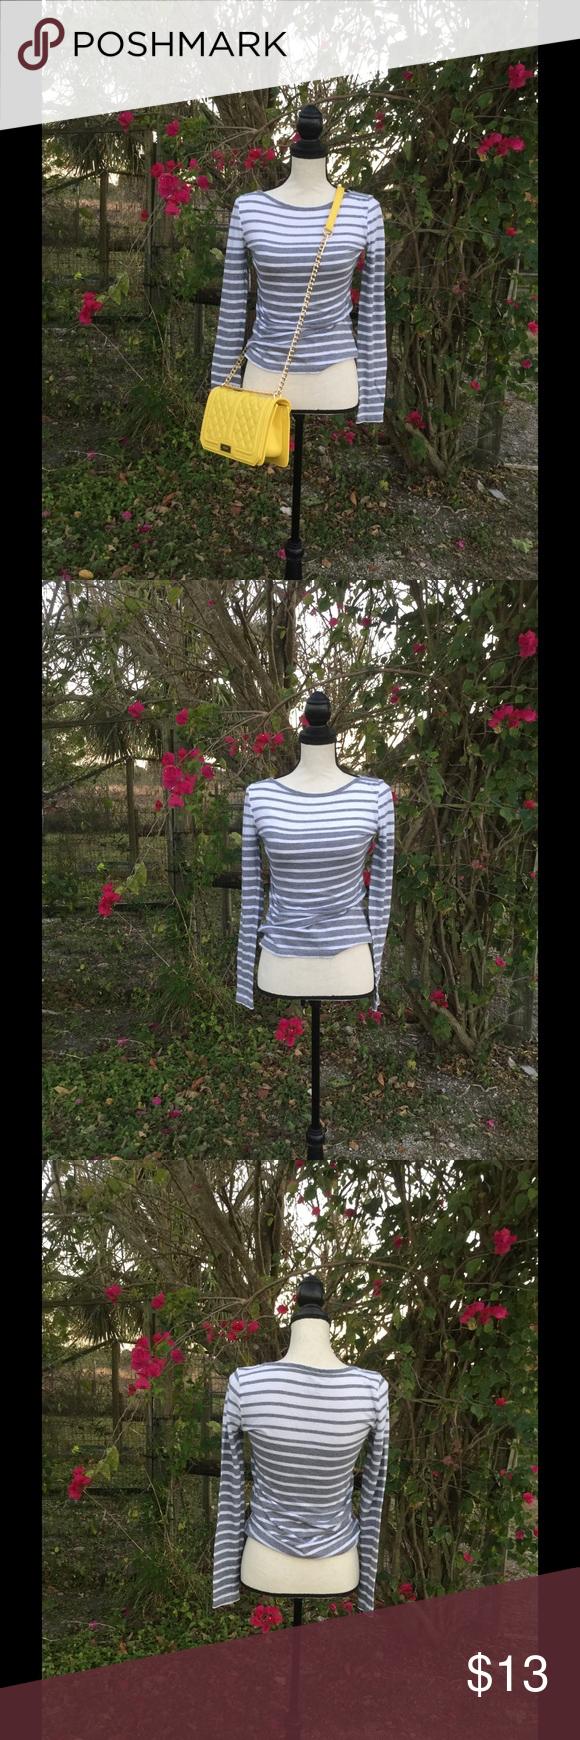 Shirt design measurements - Shopmycloset Poshmark Malawi Frica Design Measurements Measurements Length 14 Shopmycloset Howms Org Charity Devoted Orphans Widows Factory Tops